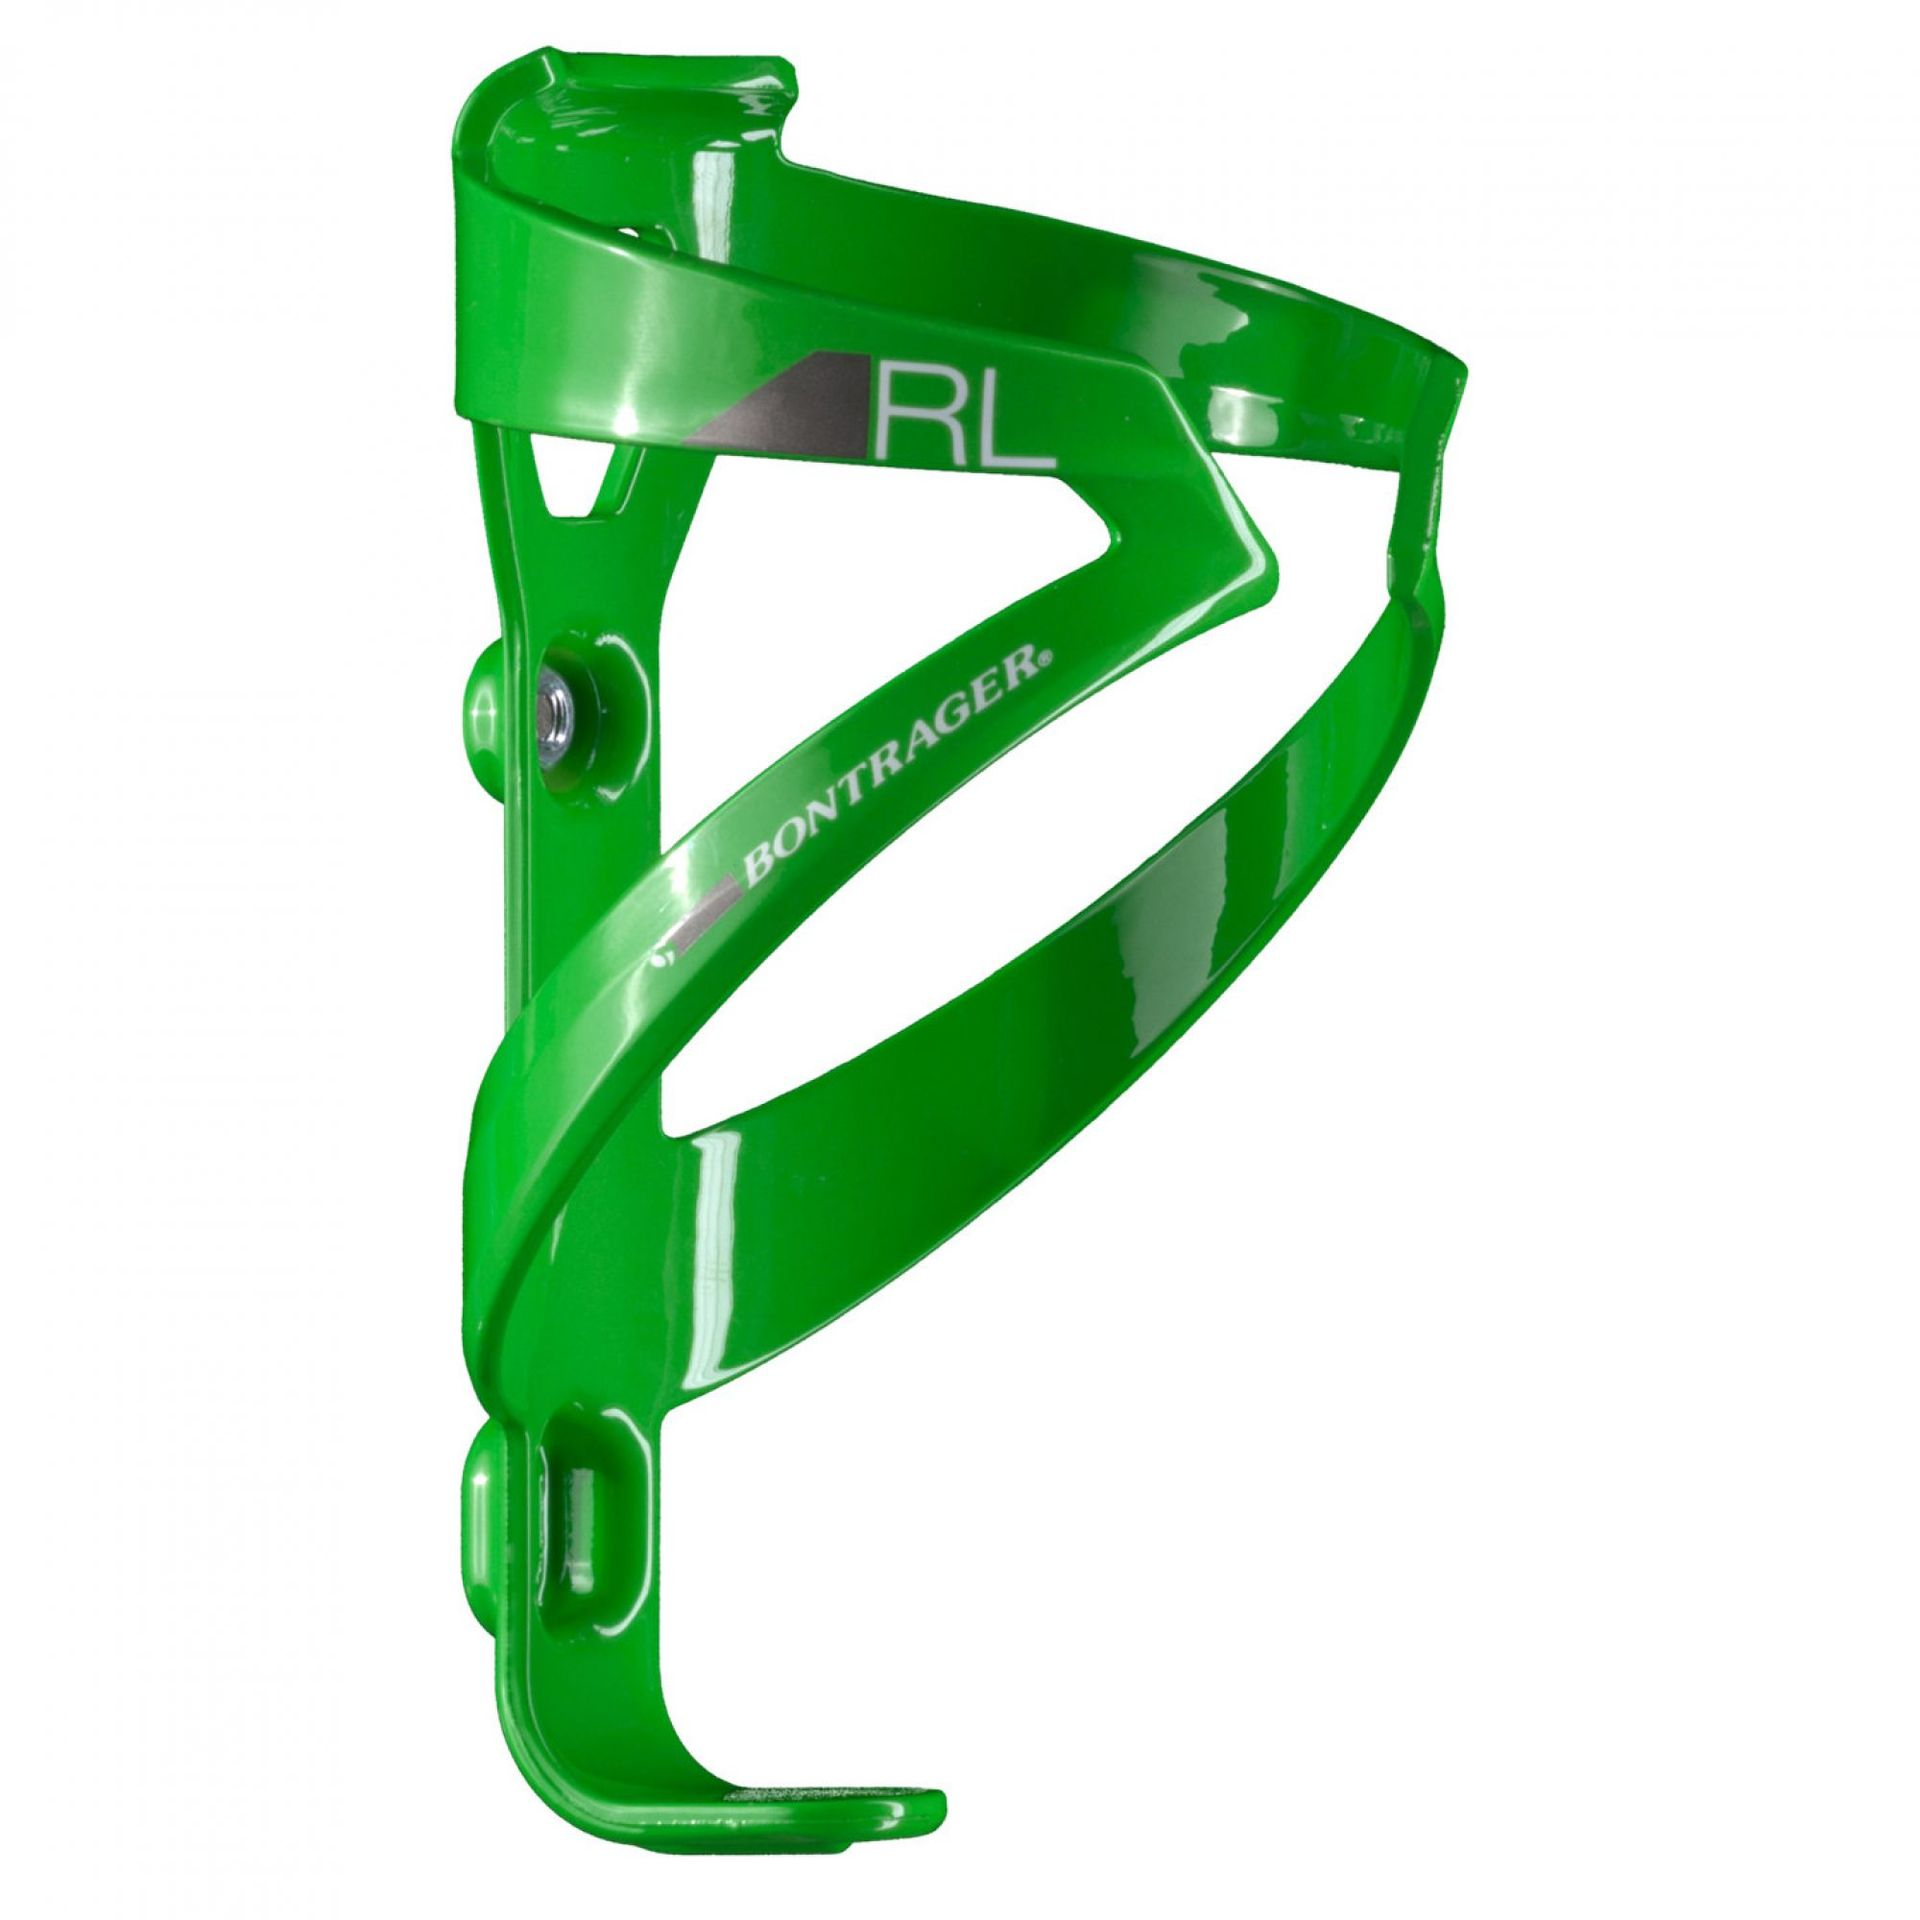 Koszyk na bidon Bontranger Race Lite zielony